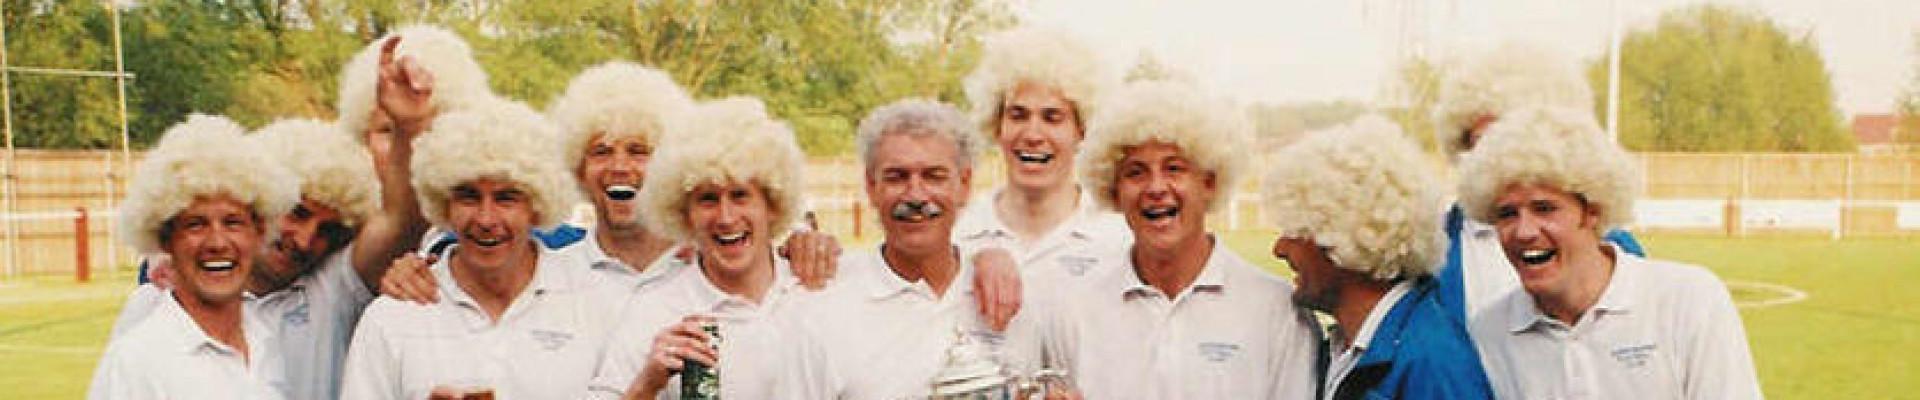 Team Photo 1999/00 Season